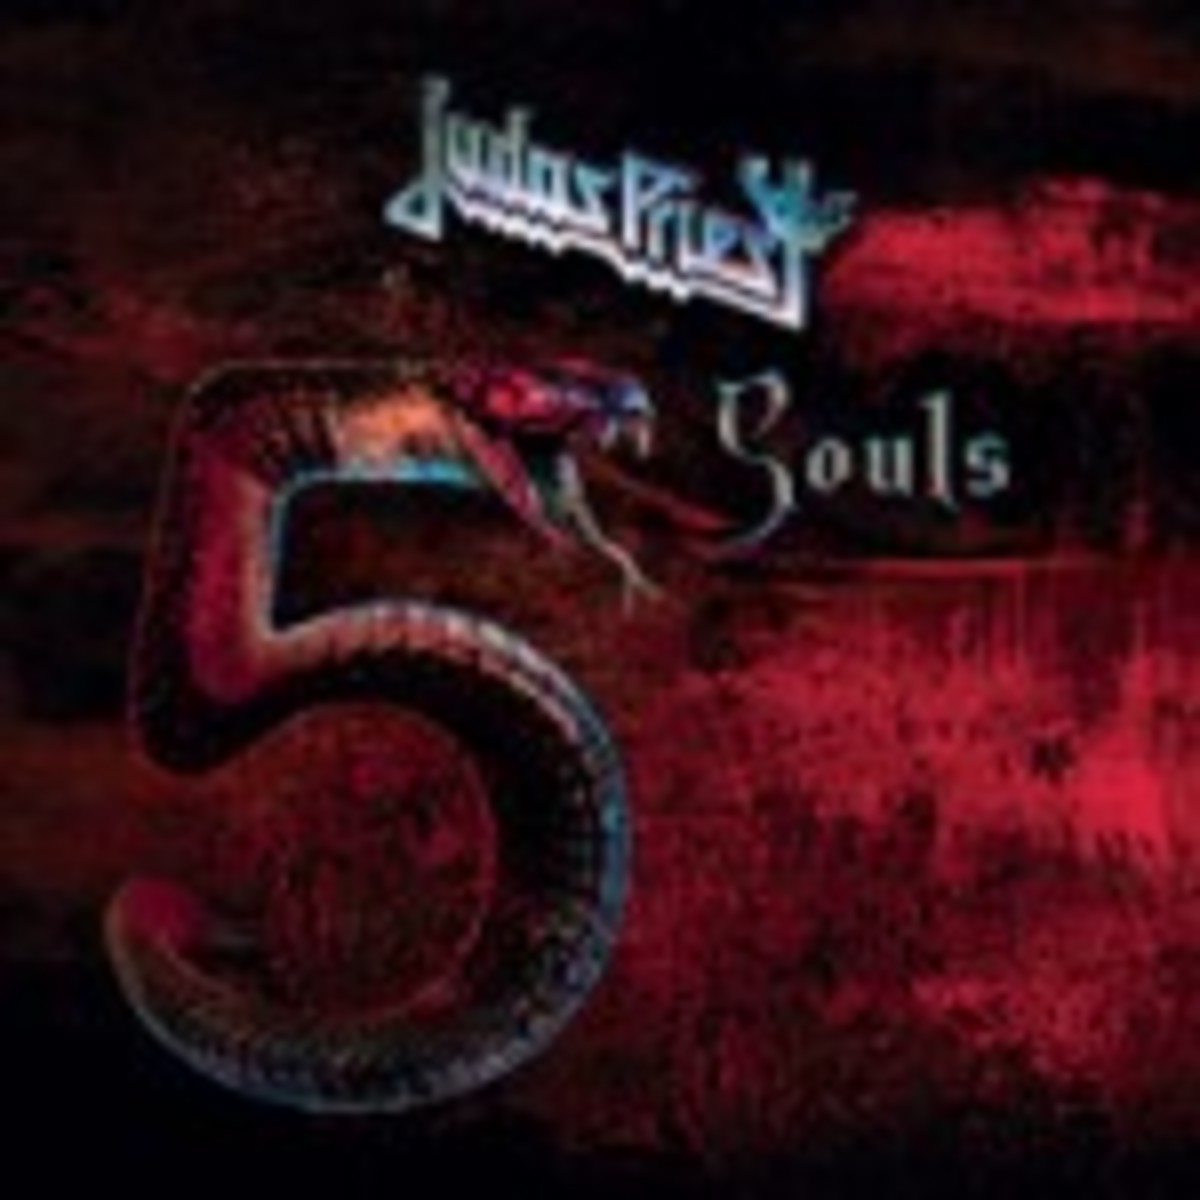 Judas Priest 5 souls on vinyl